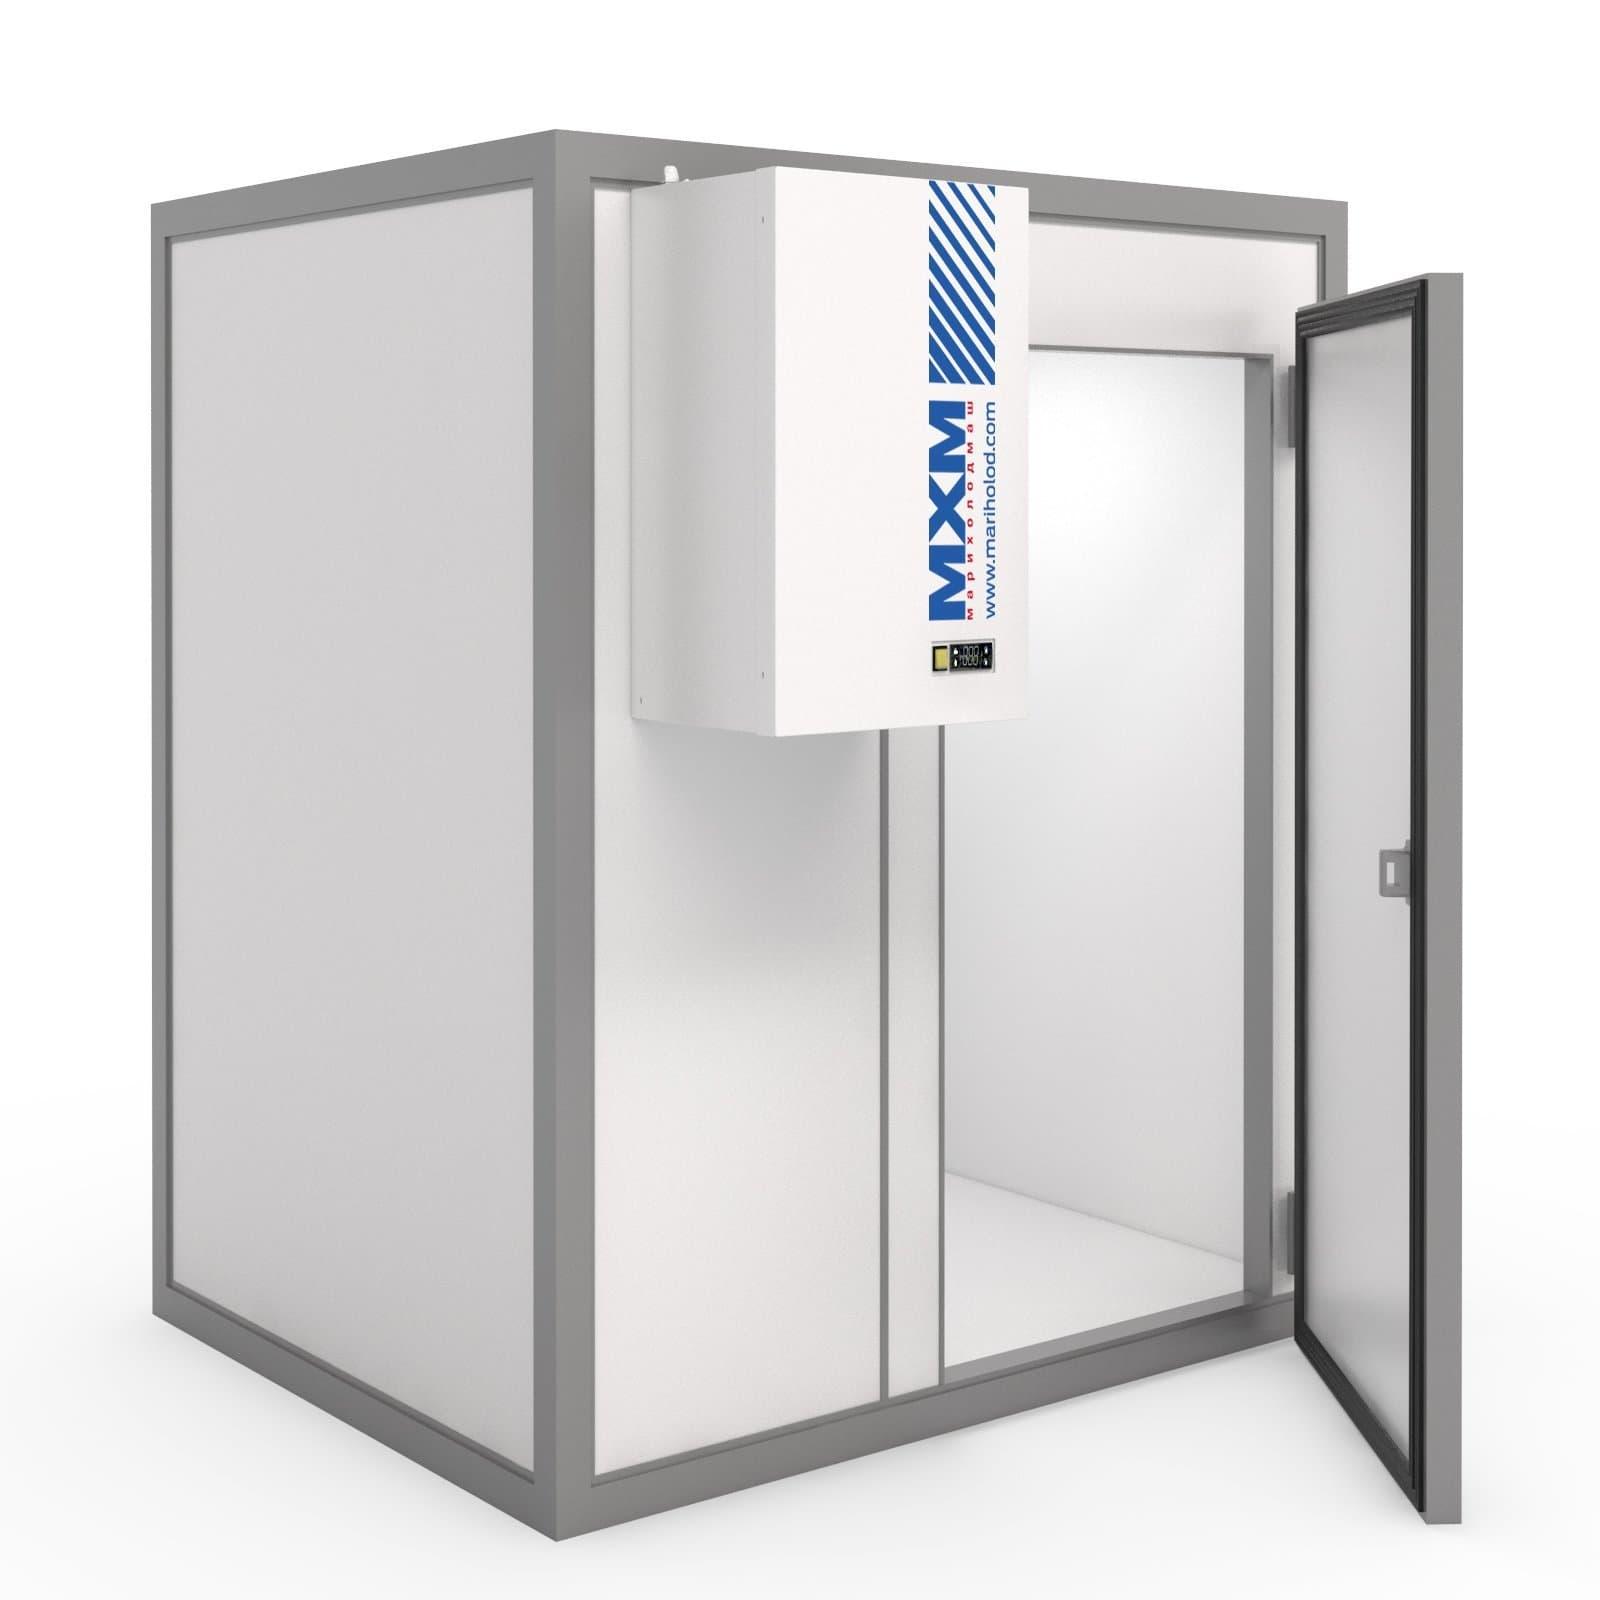 Камера холодильная МХМ КХН-12,85 1660×4360×2200